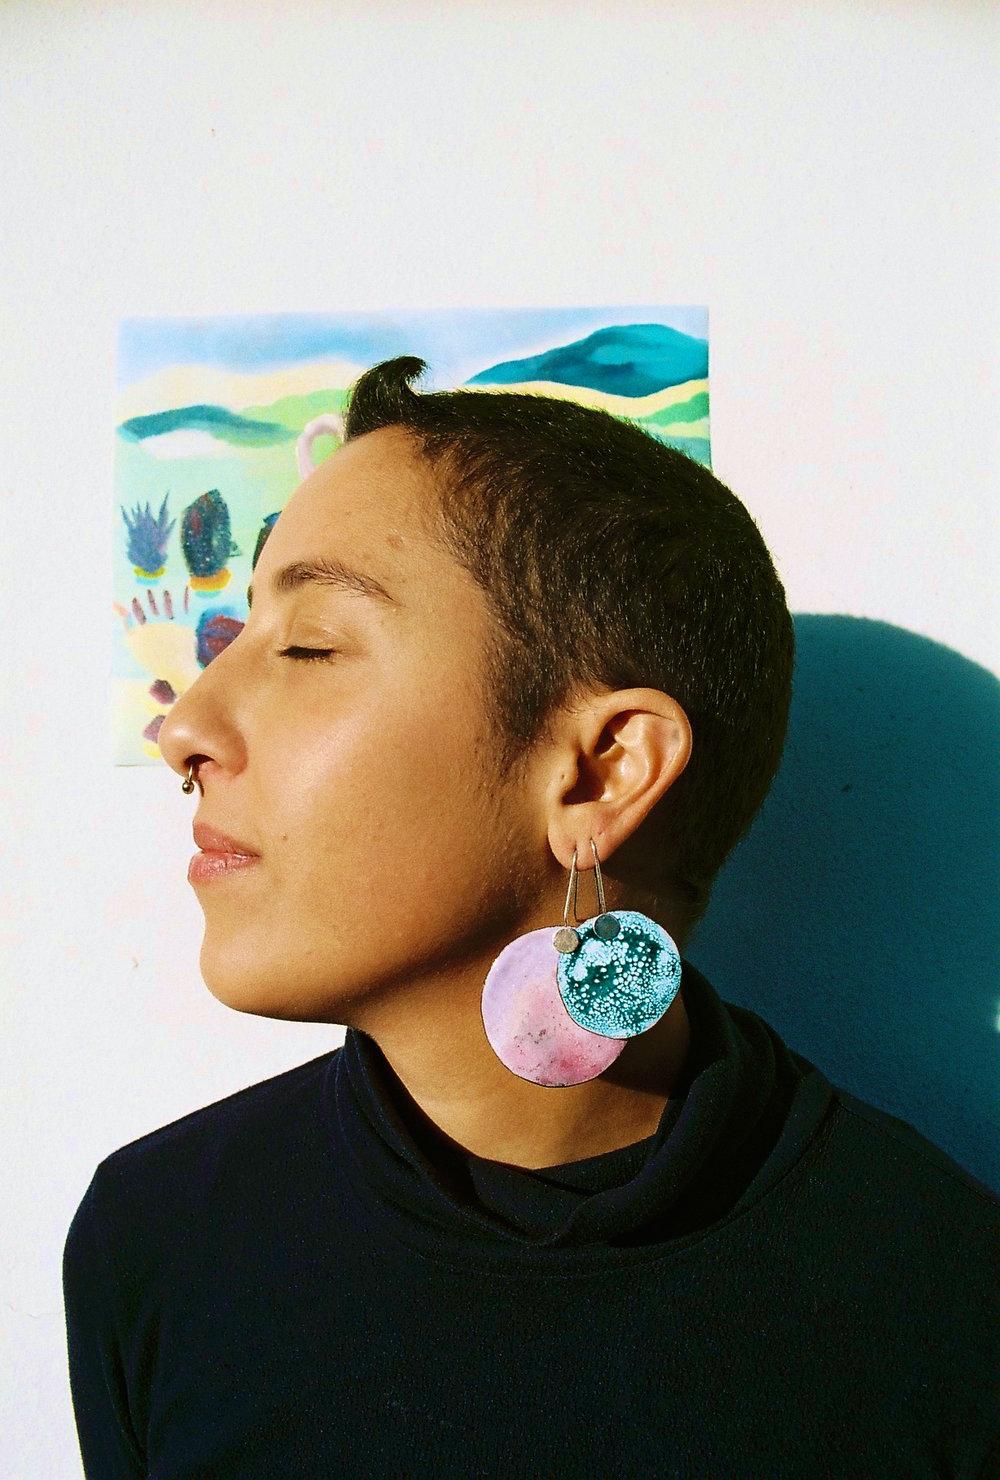 pink-green-imaginary-planets-ada-hodgson-contemporary-australian-jewellery-designer-jeweller-design-handmade-mebourne-made-custom-colourful-enamel-sterling-silver-gold-jewelry-statement-ring-earrings